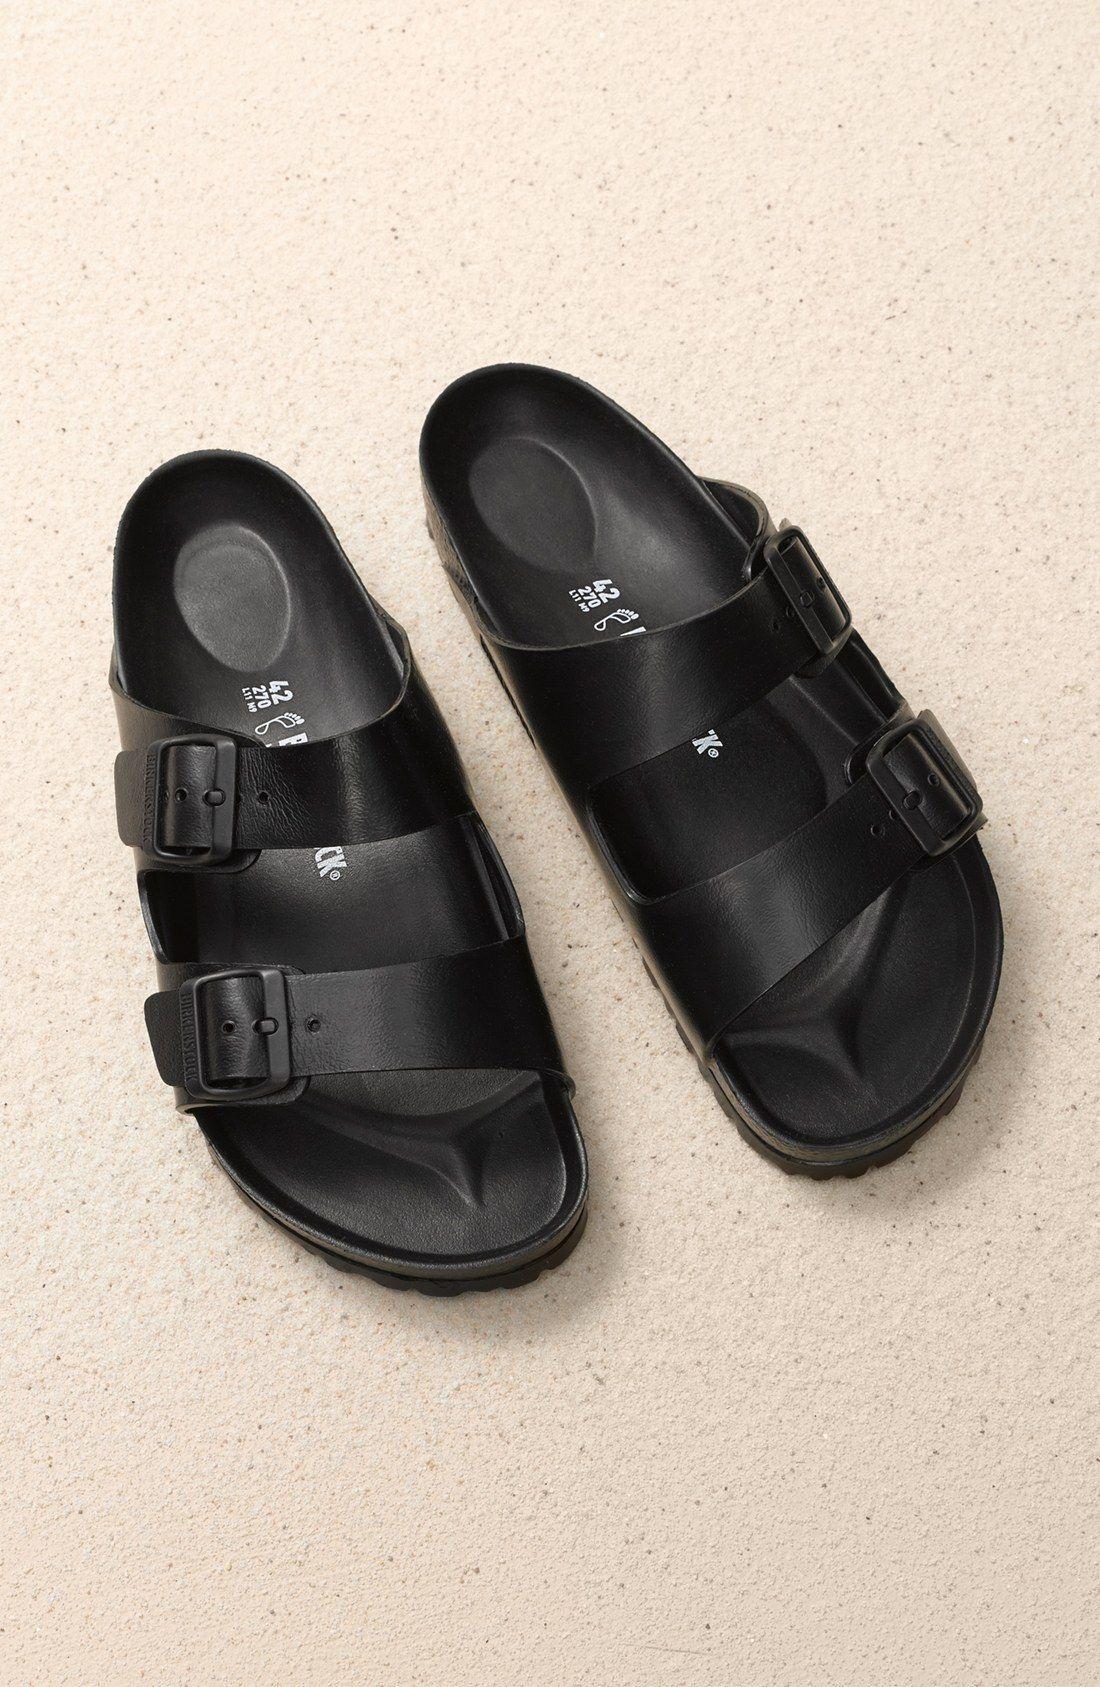 7ba0ea8b2f75 Alternate Image 8 - Birkenstock  Essentials - Arizona EVA  Waterproof Slide  Sandal (Men)